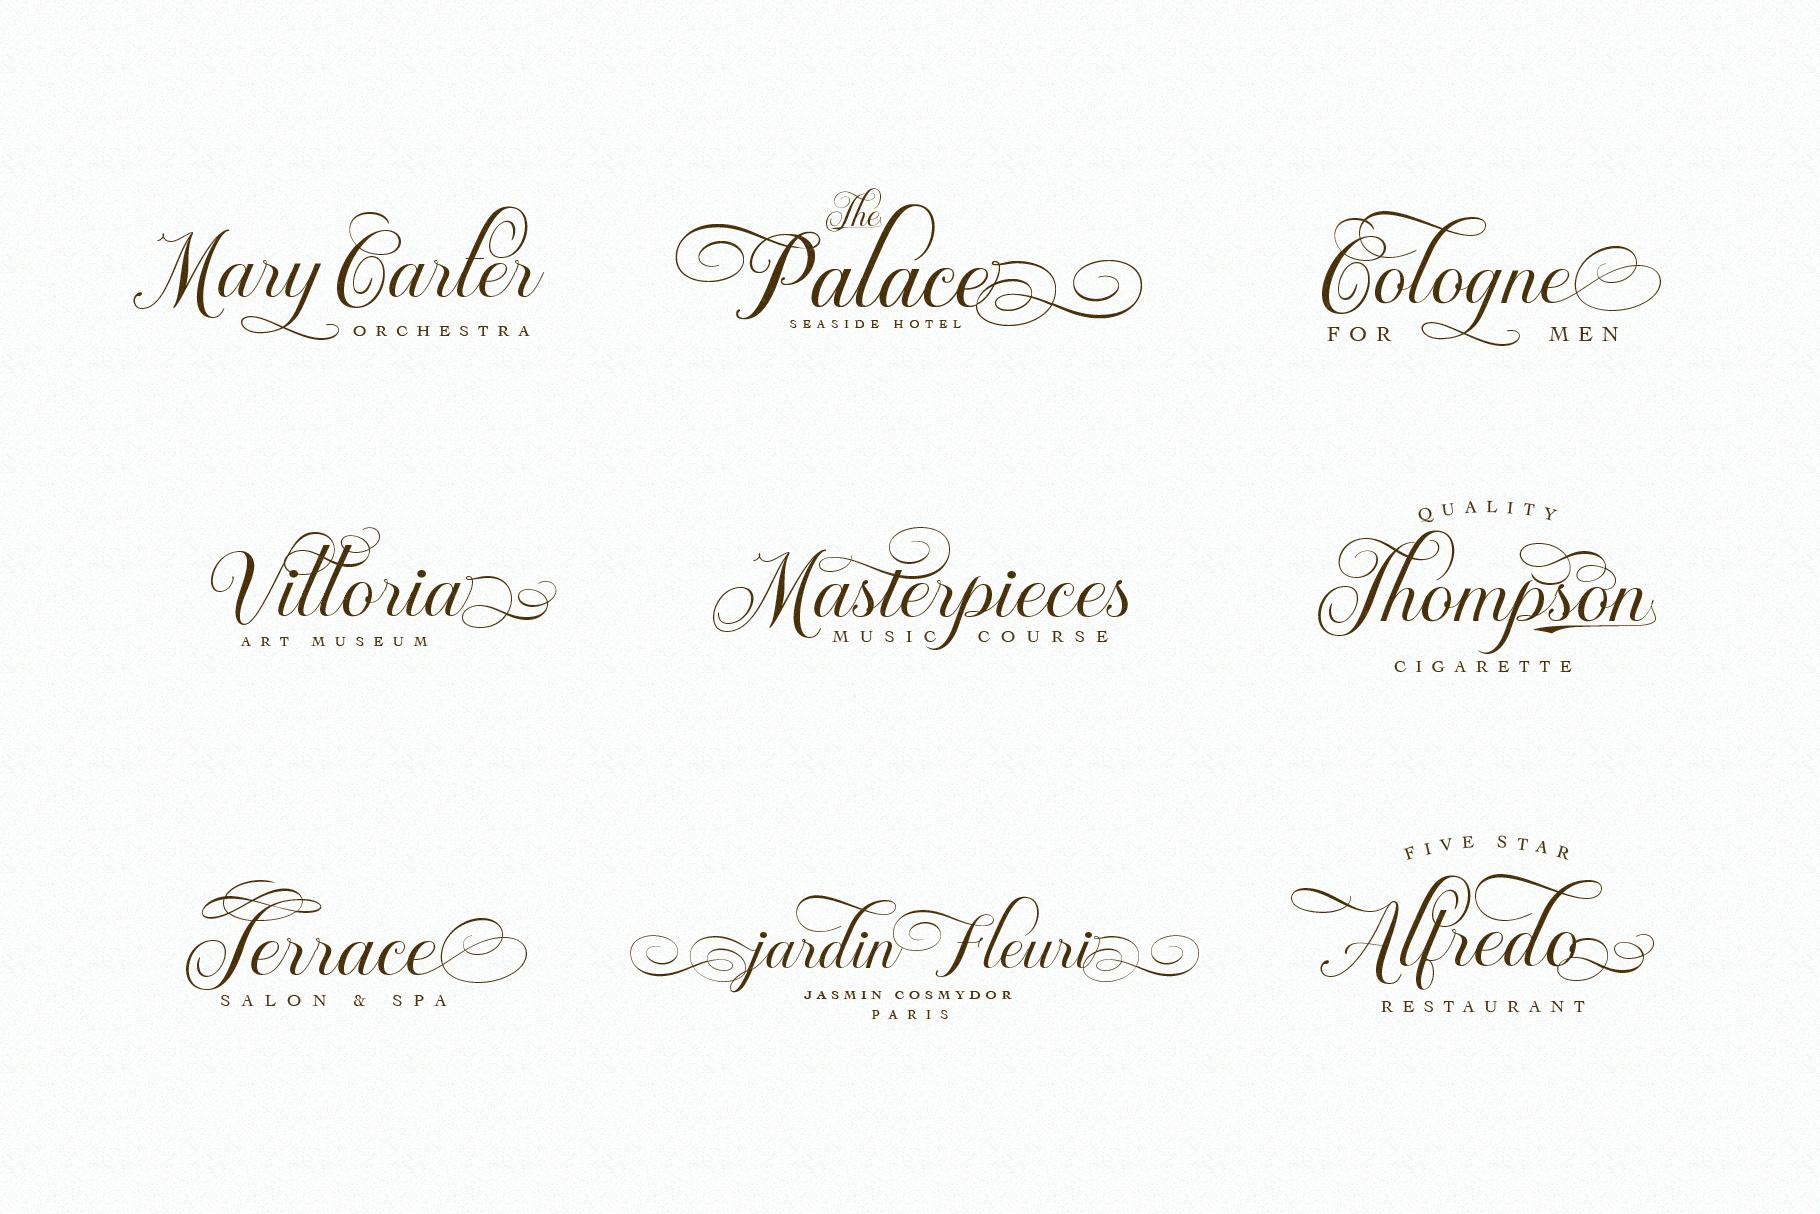 Brignola Elegant Calligraphy example image 10